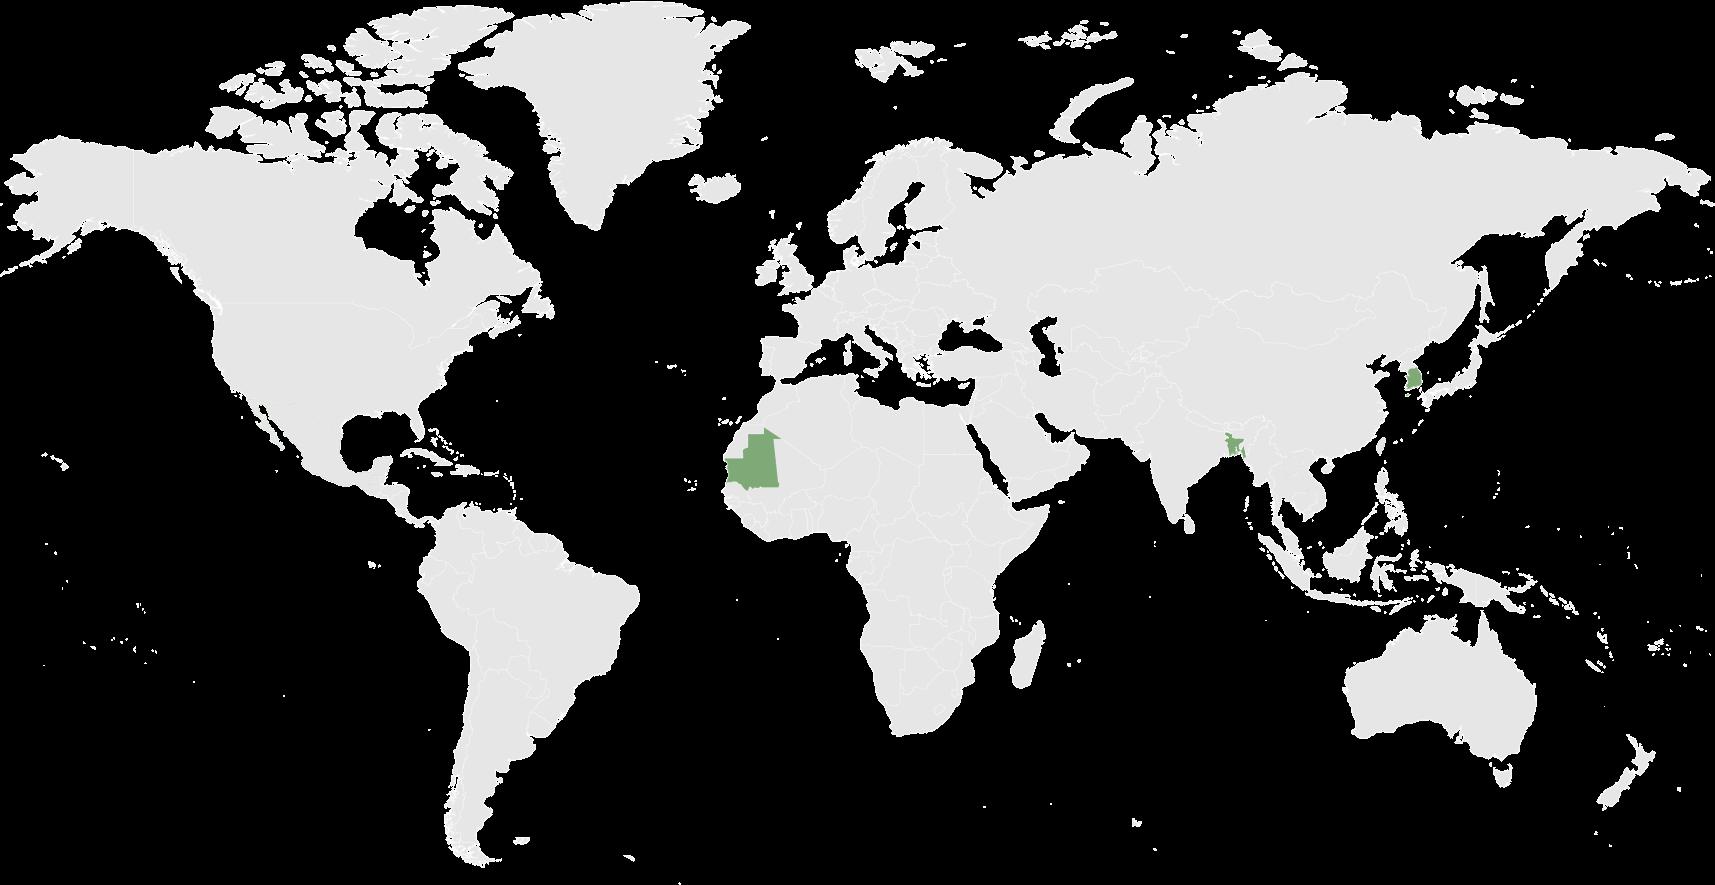 FY 2020